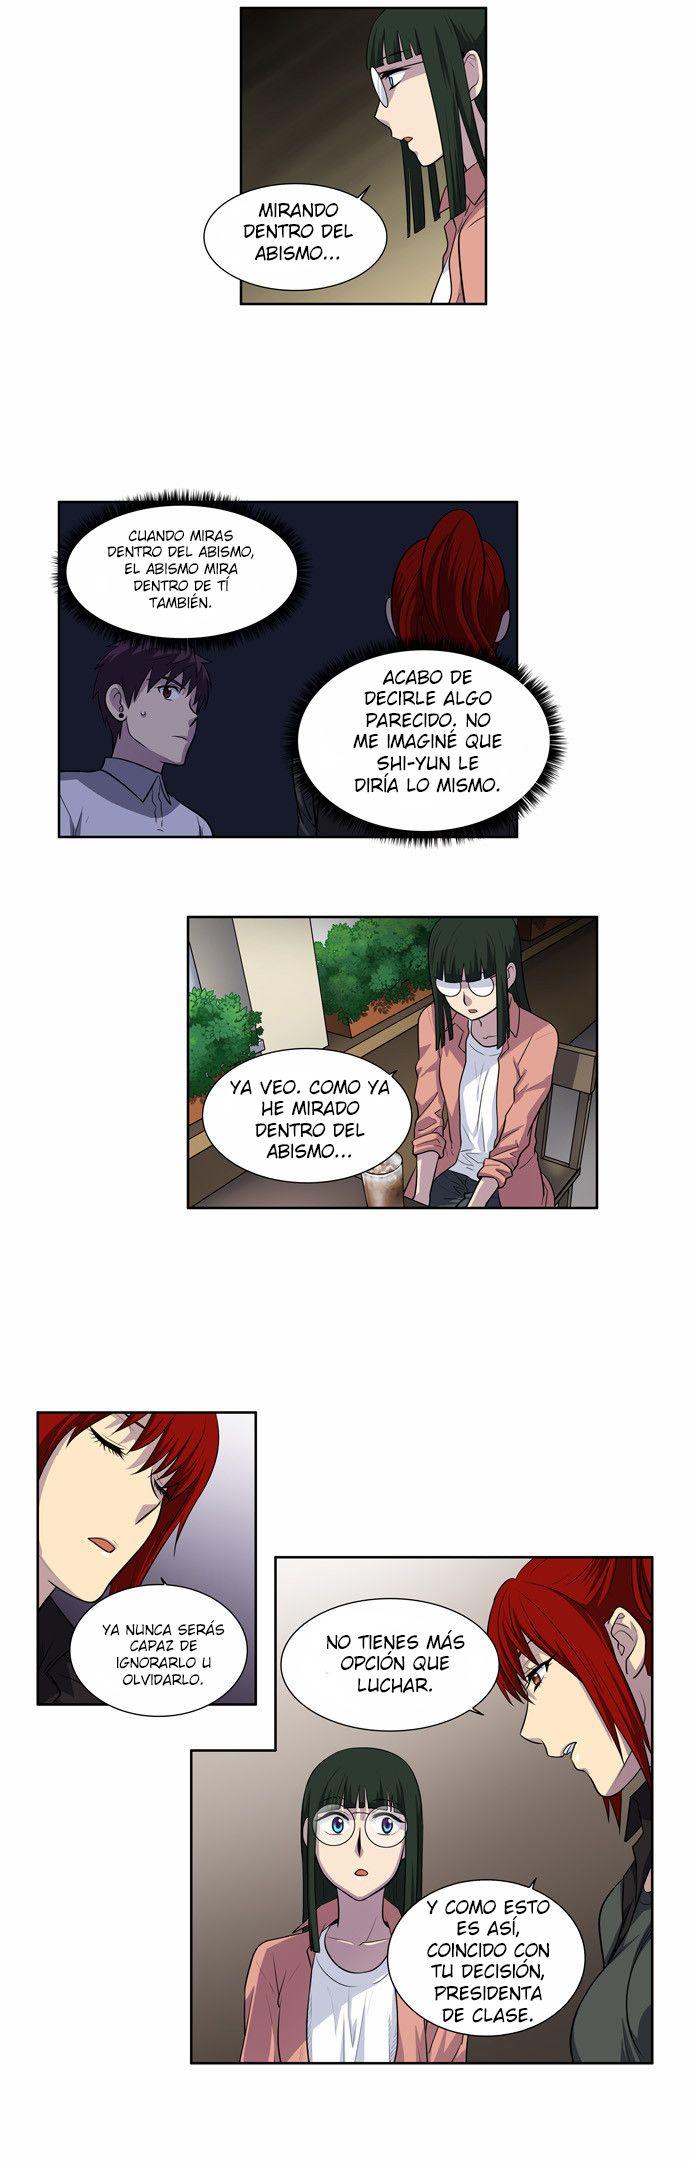 https://c5.ninemanga.com/es_manga/61/1725/476787/dd95829de39fe21f384685c07a1628d8.jpg Page 6